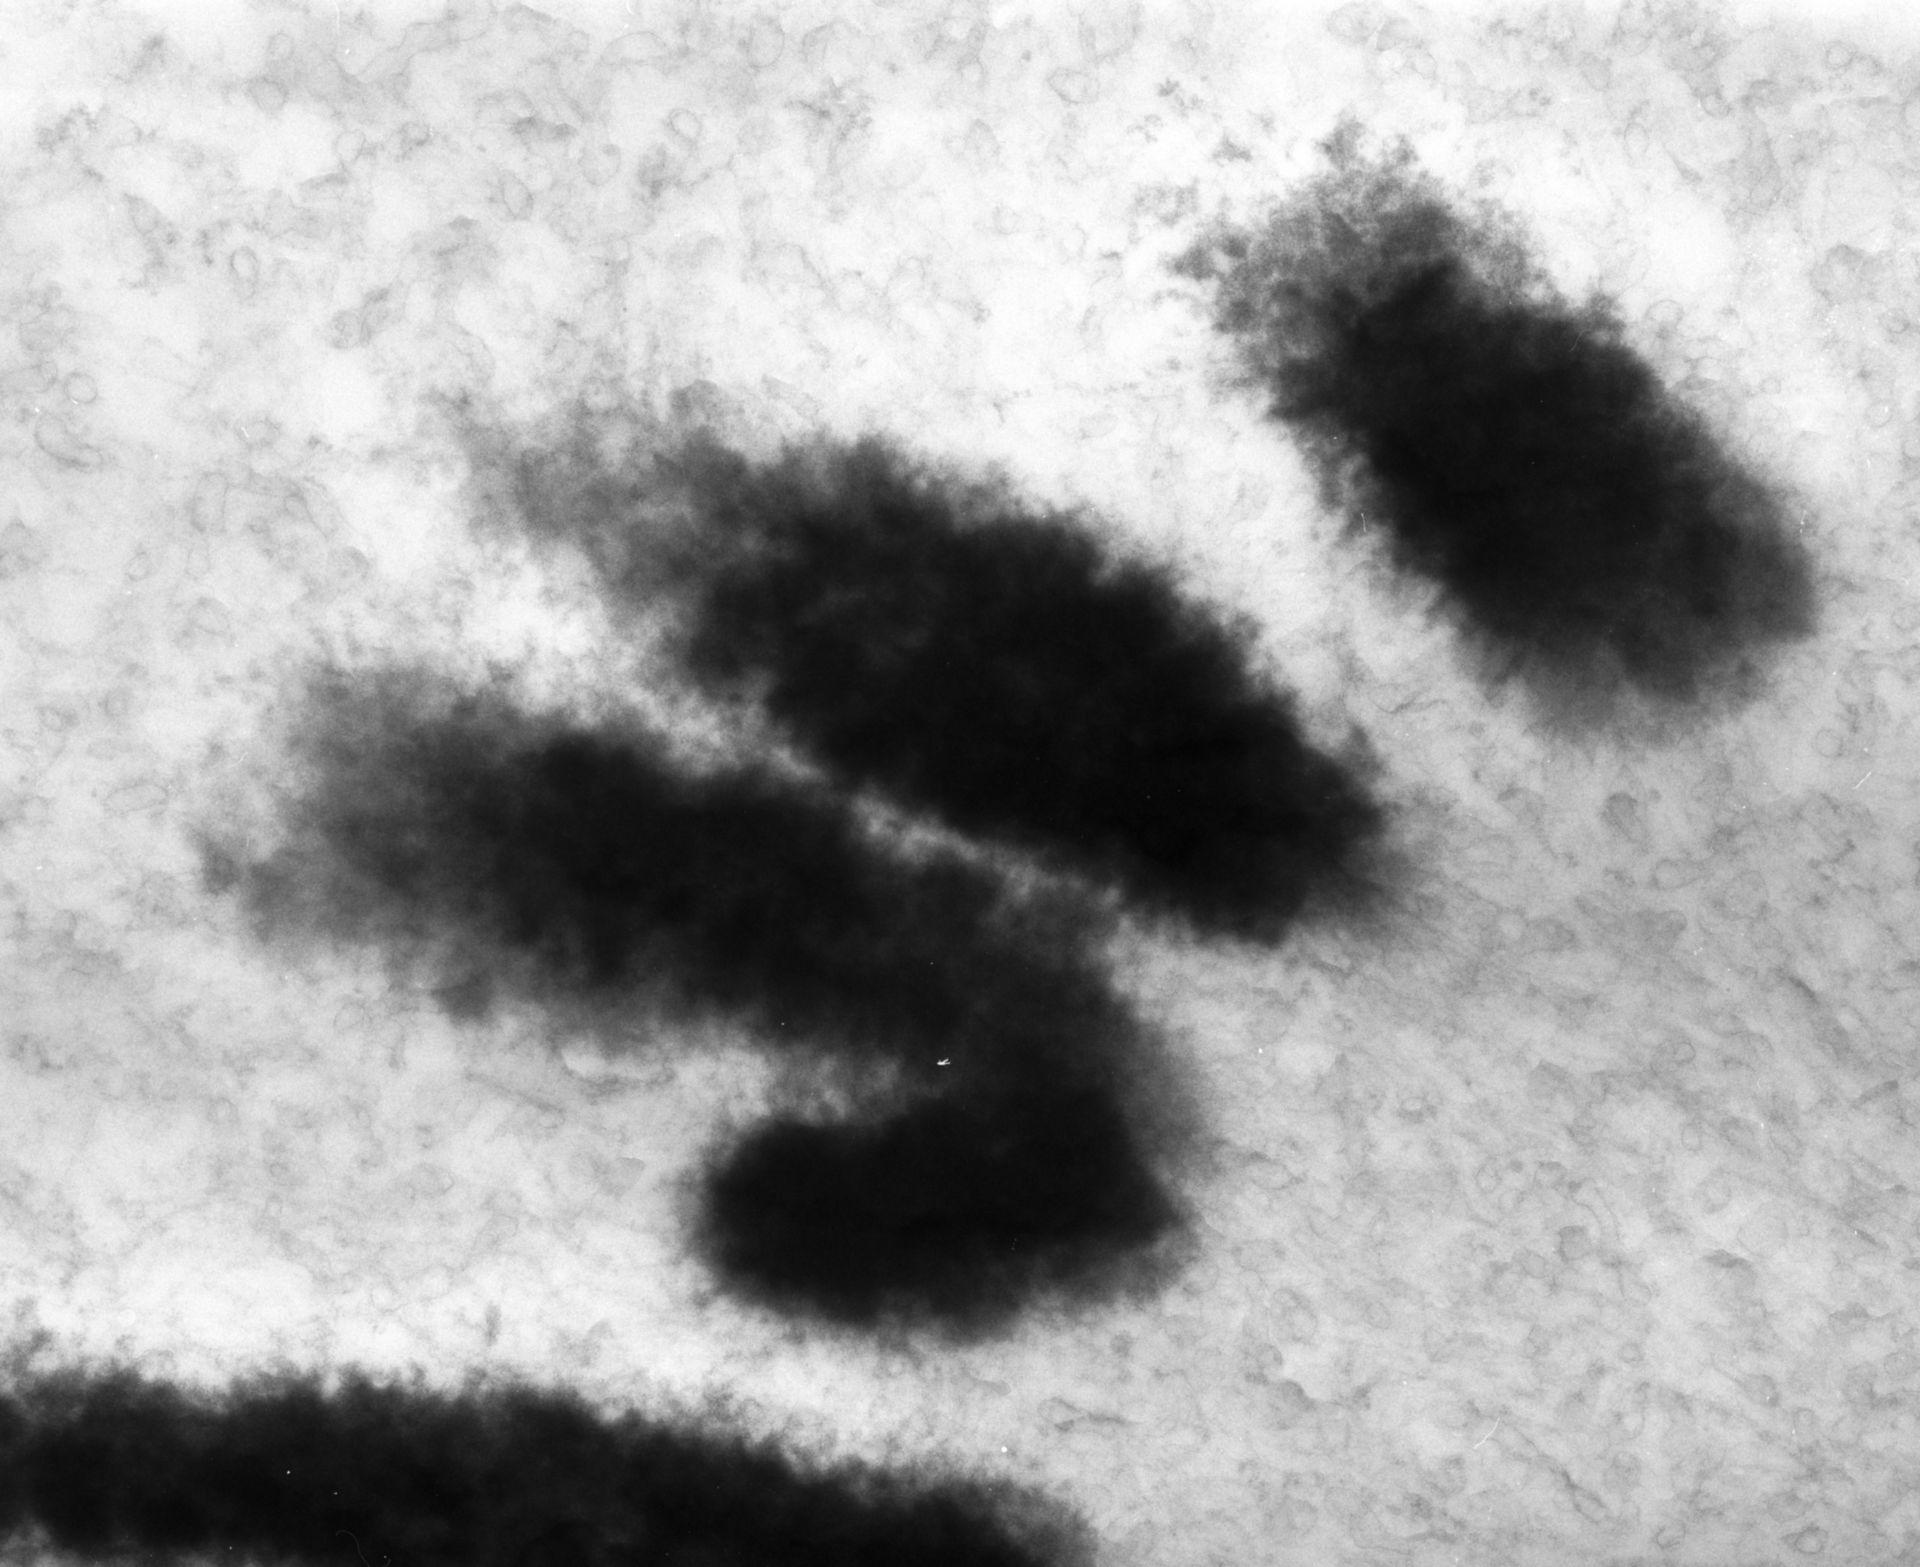 Haemanthus katharinae (Nuclear chromosome) - CIL:11910